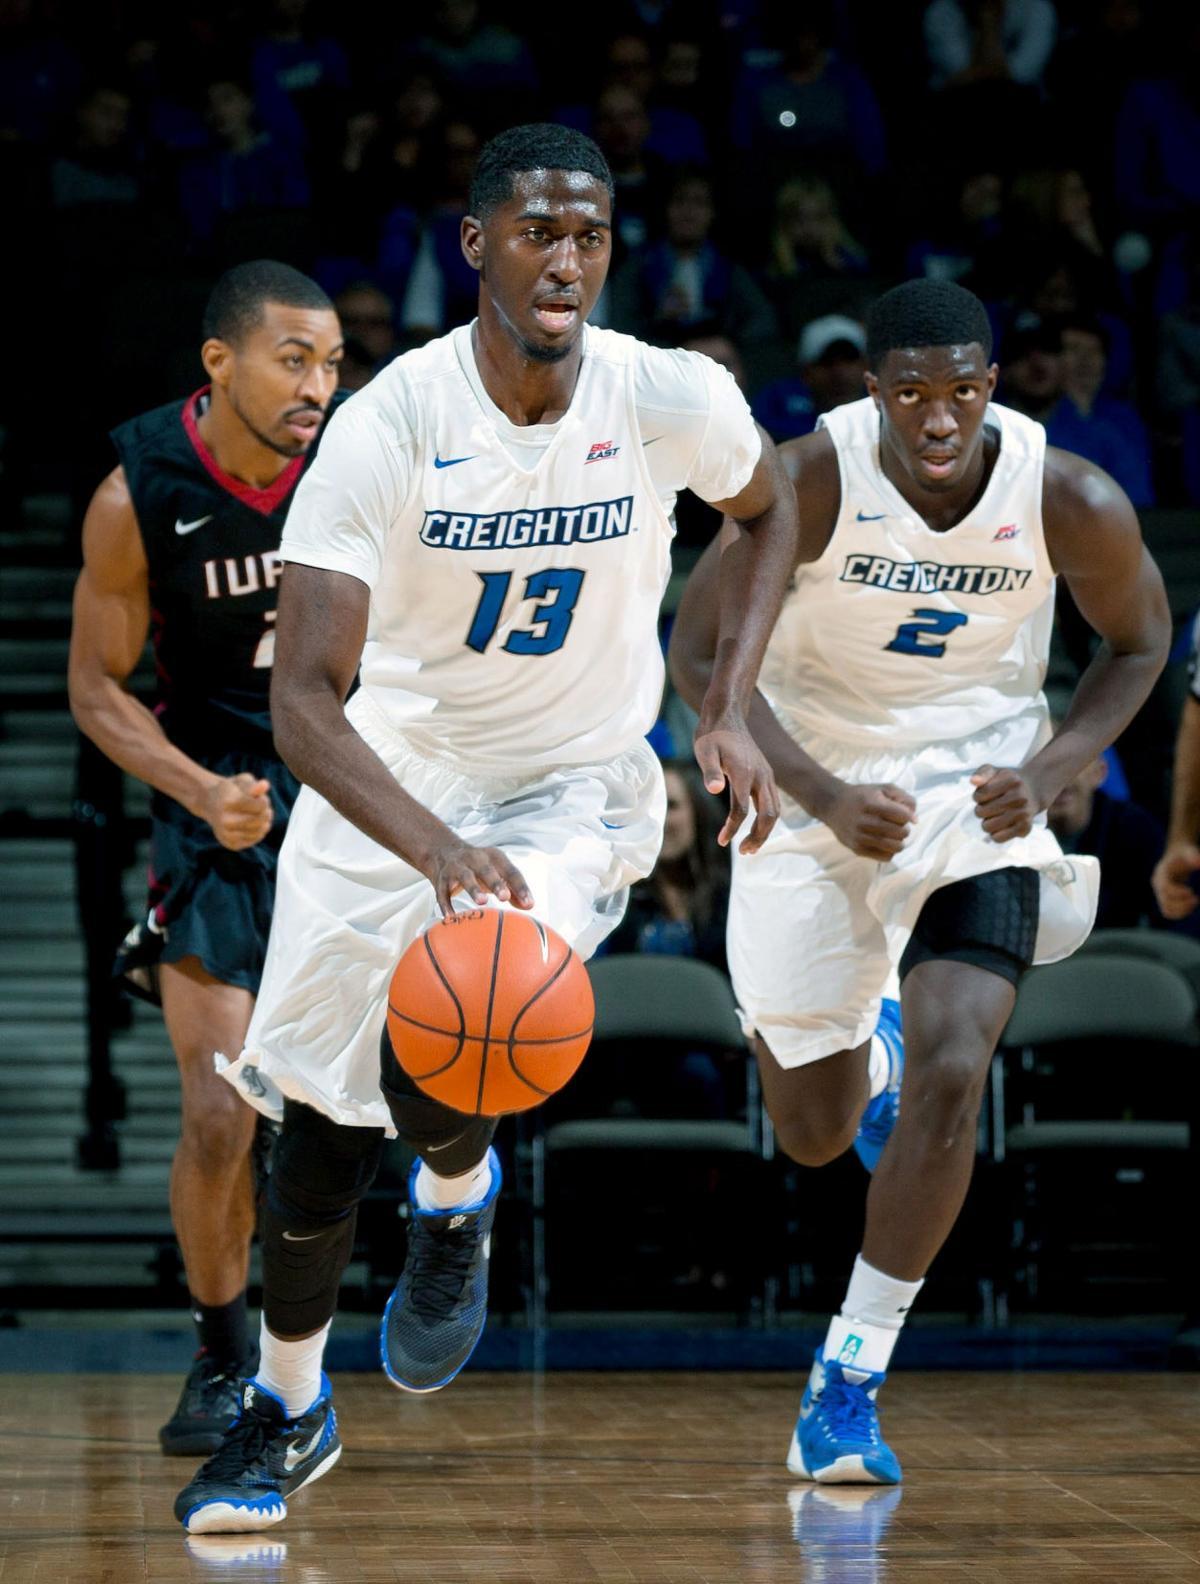 CU basketball: Huff's return lifts teammates' spirits